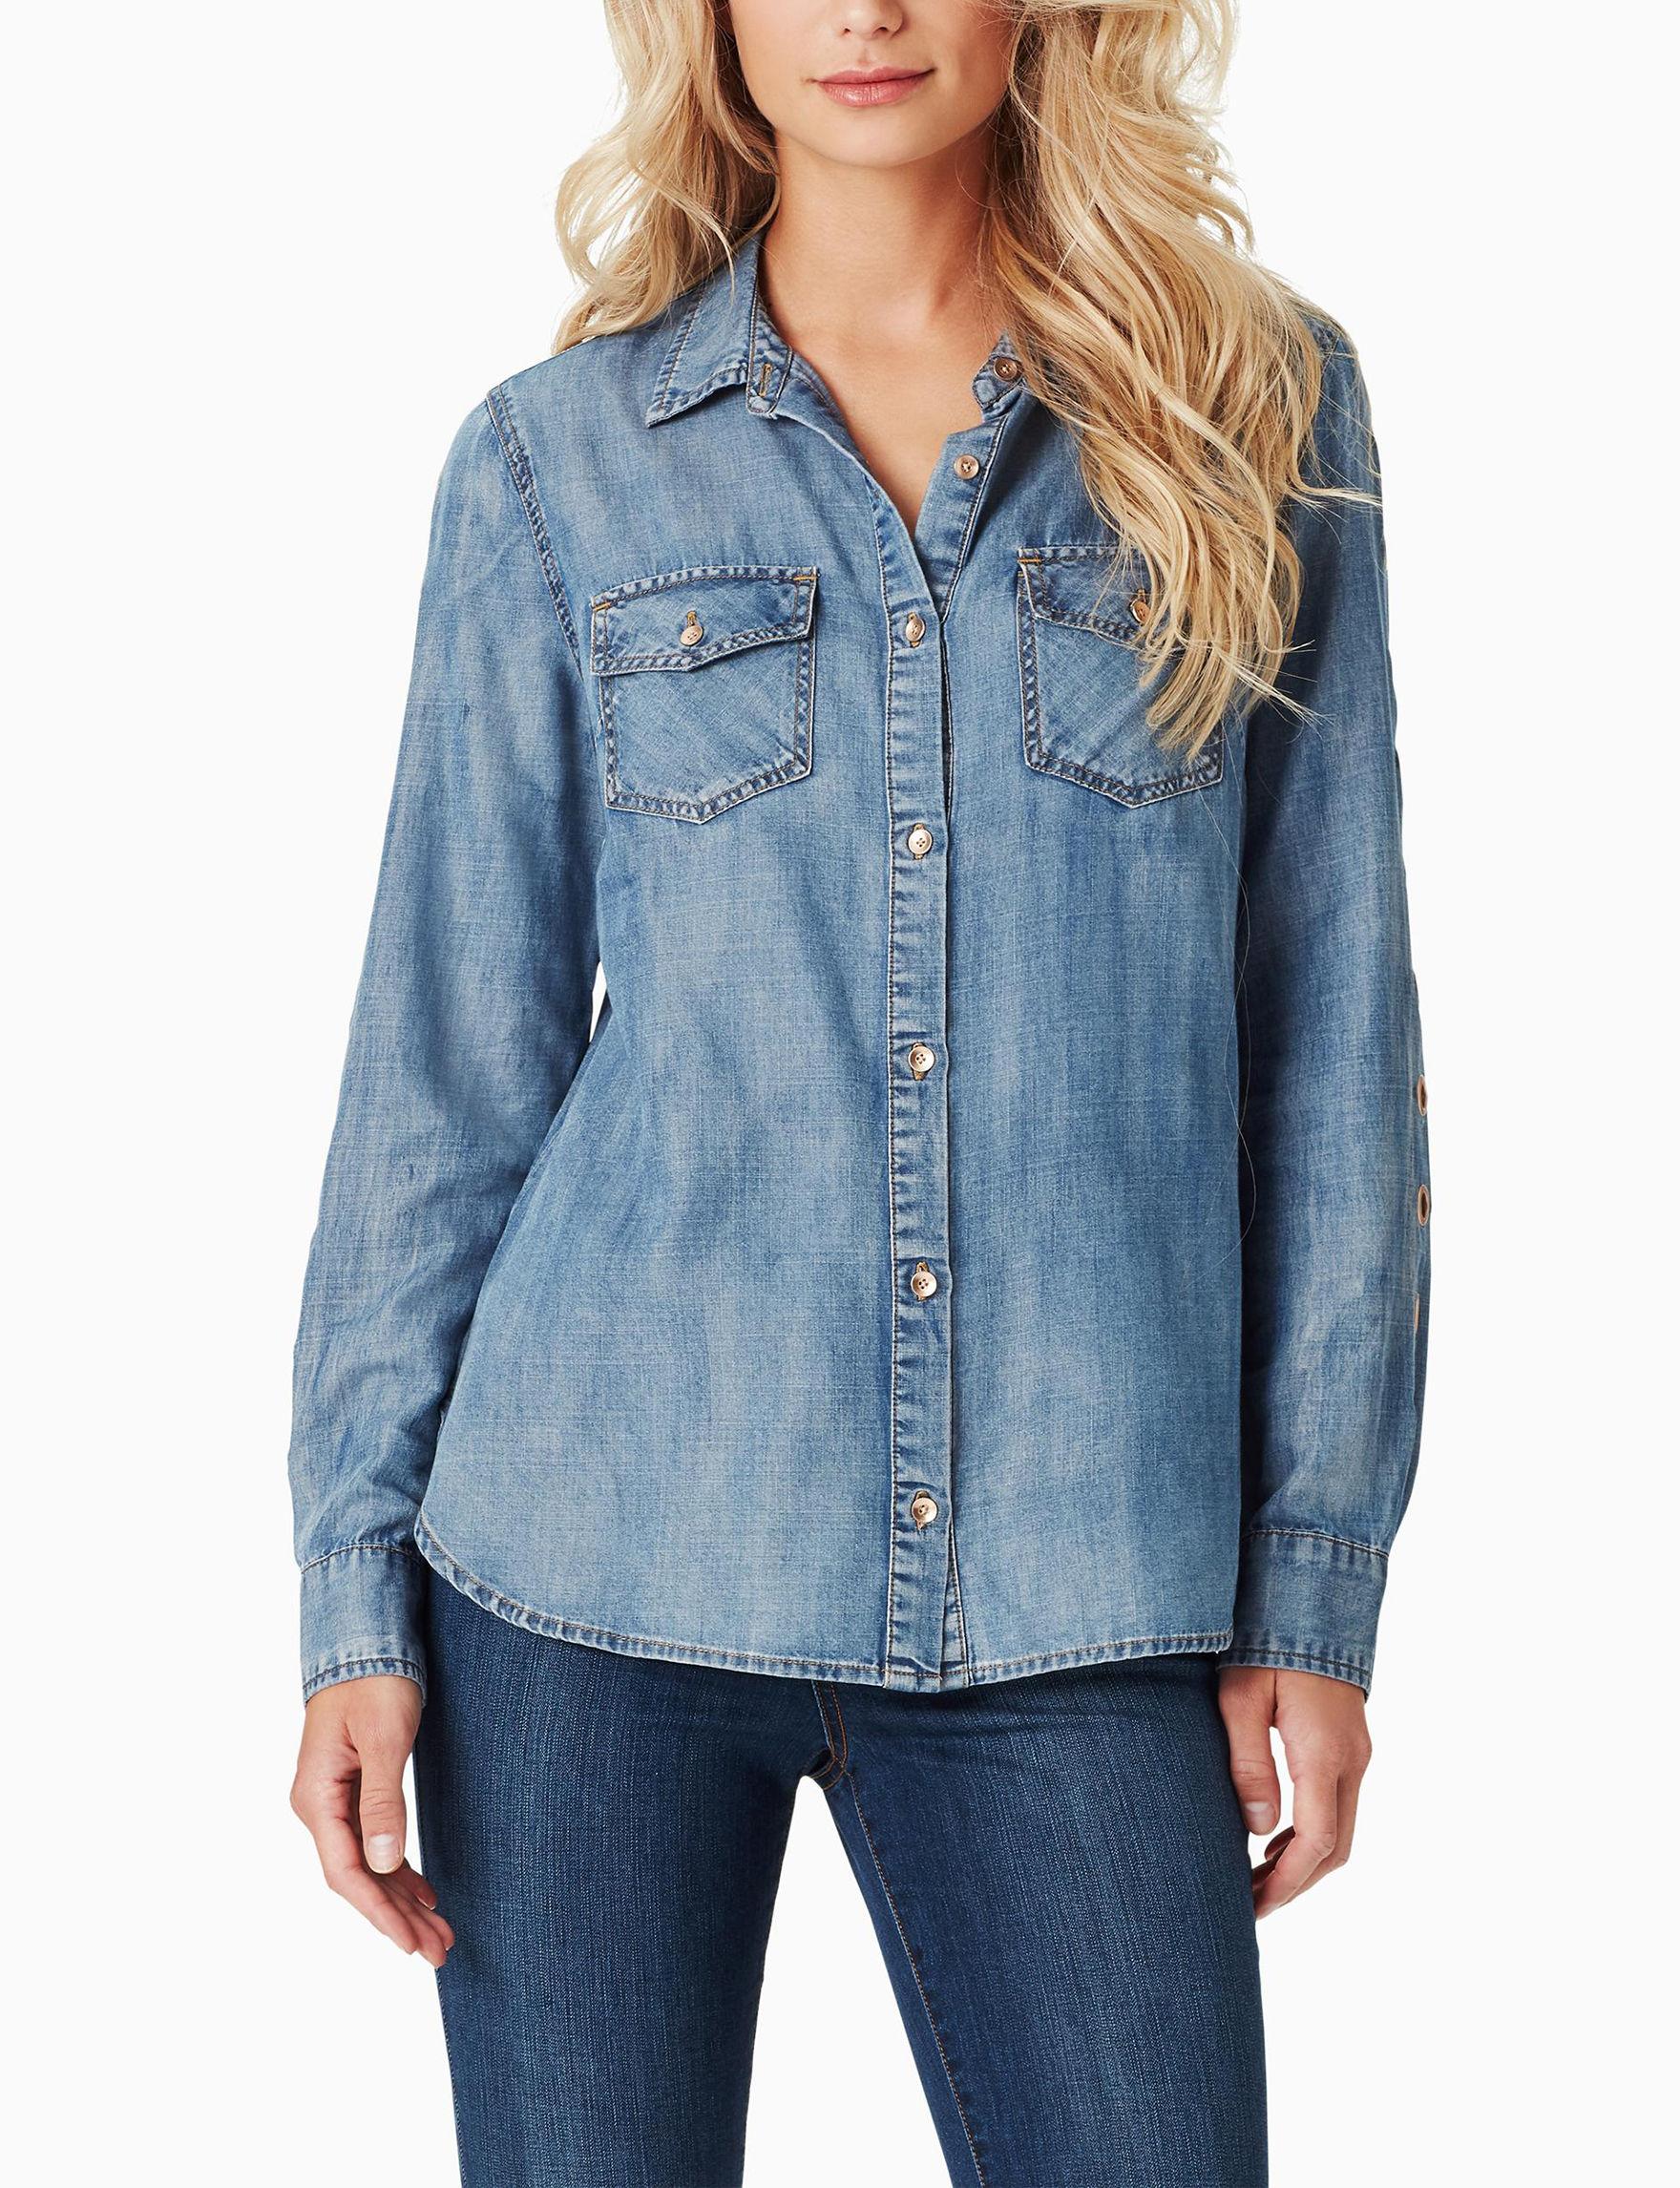 Jessica Simpson Blue Shirts & Blouses